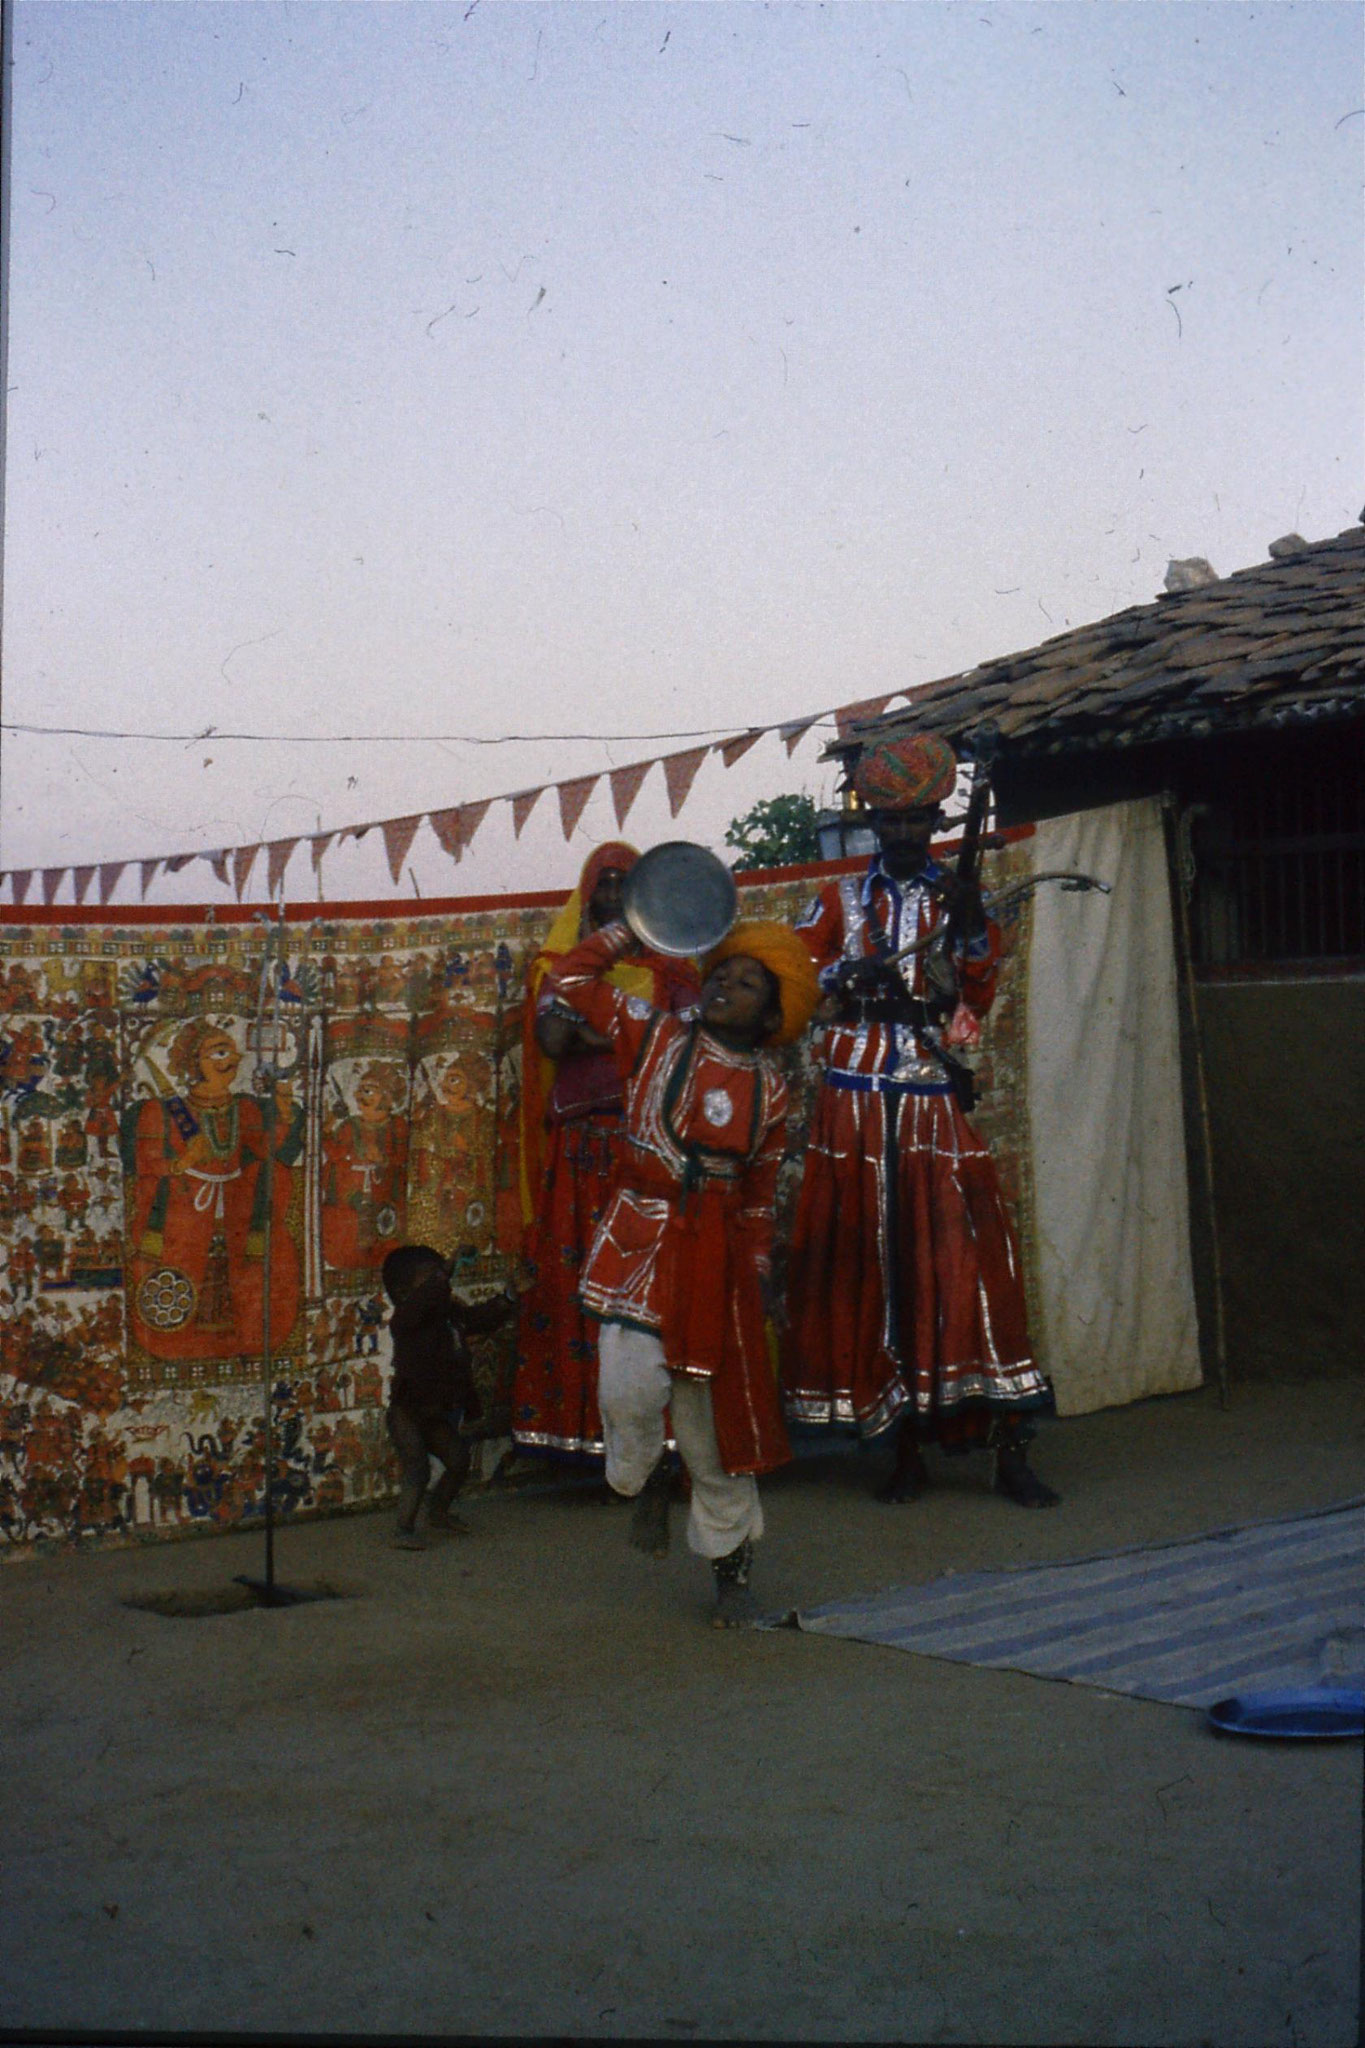 8/12/1989: 29: Udaipur Shilp Gram Craft Centre dancing